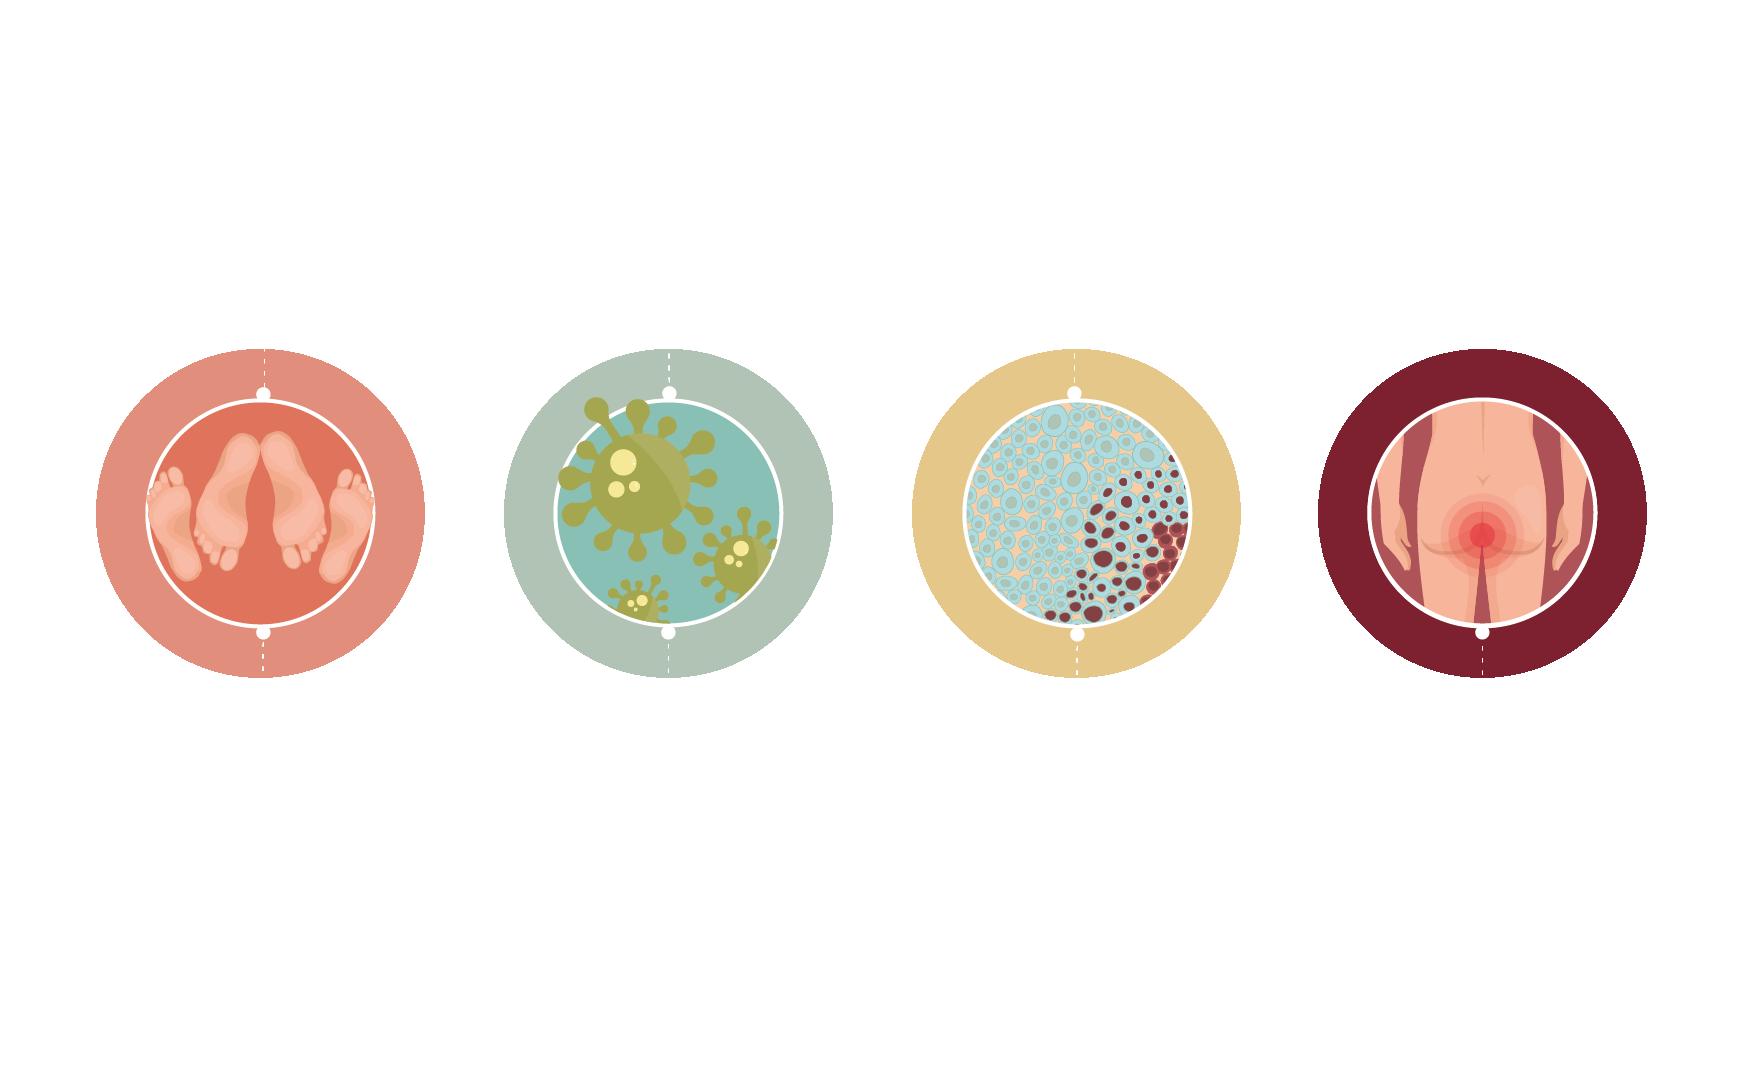 hpv vakcina és eller nej